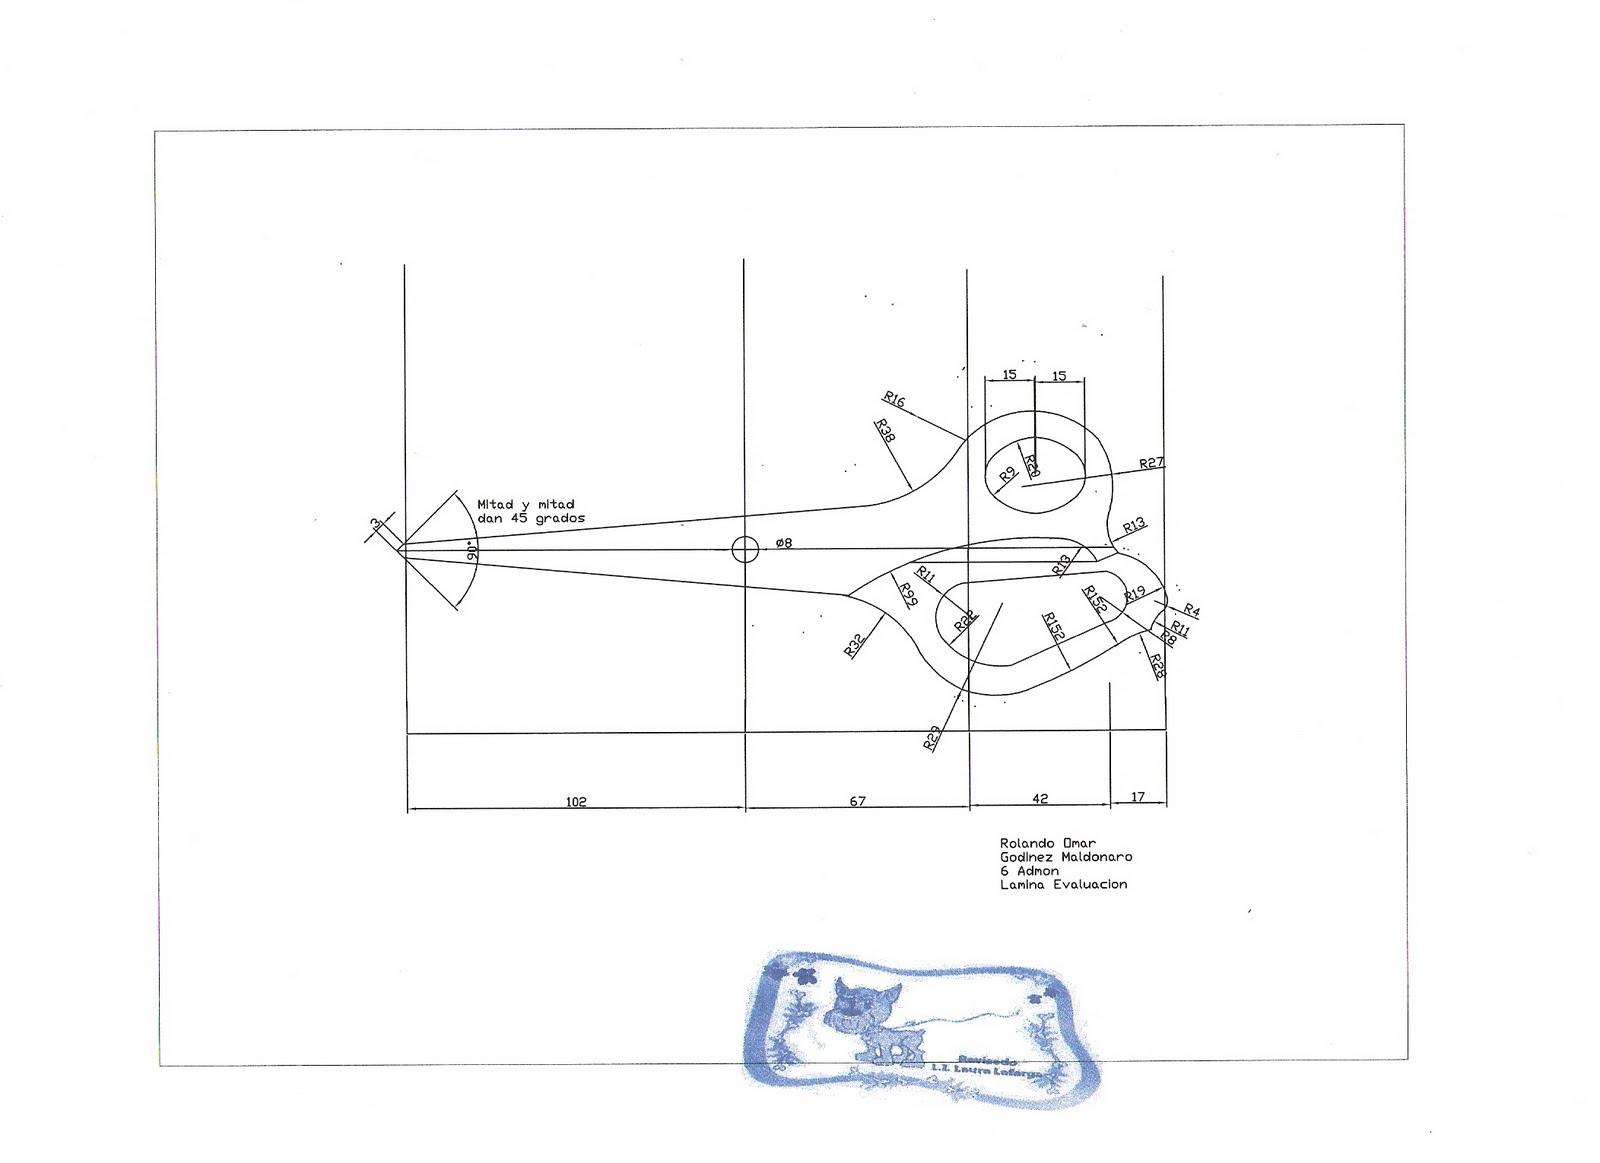 Programas de dibujo tecnico autocad gratis archiutorrent for Programas de dibujo de cocinas gratis